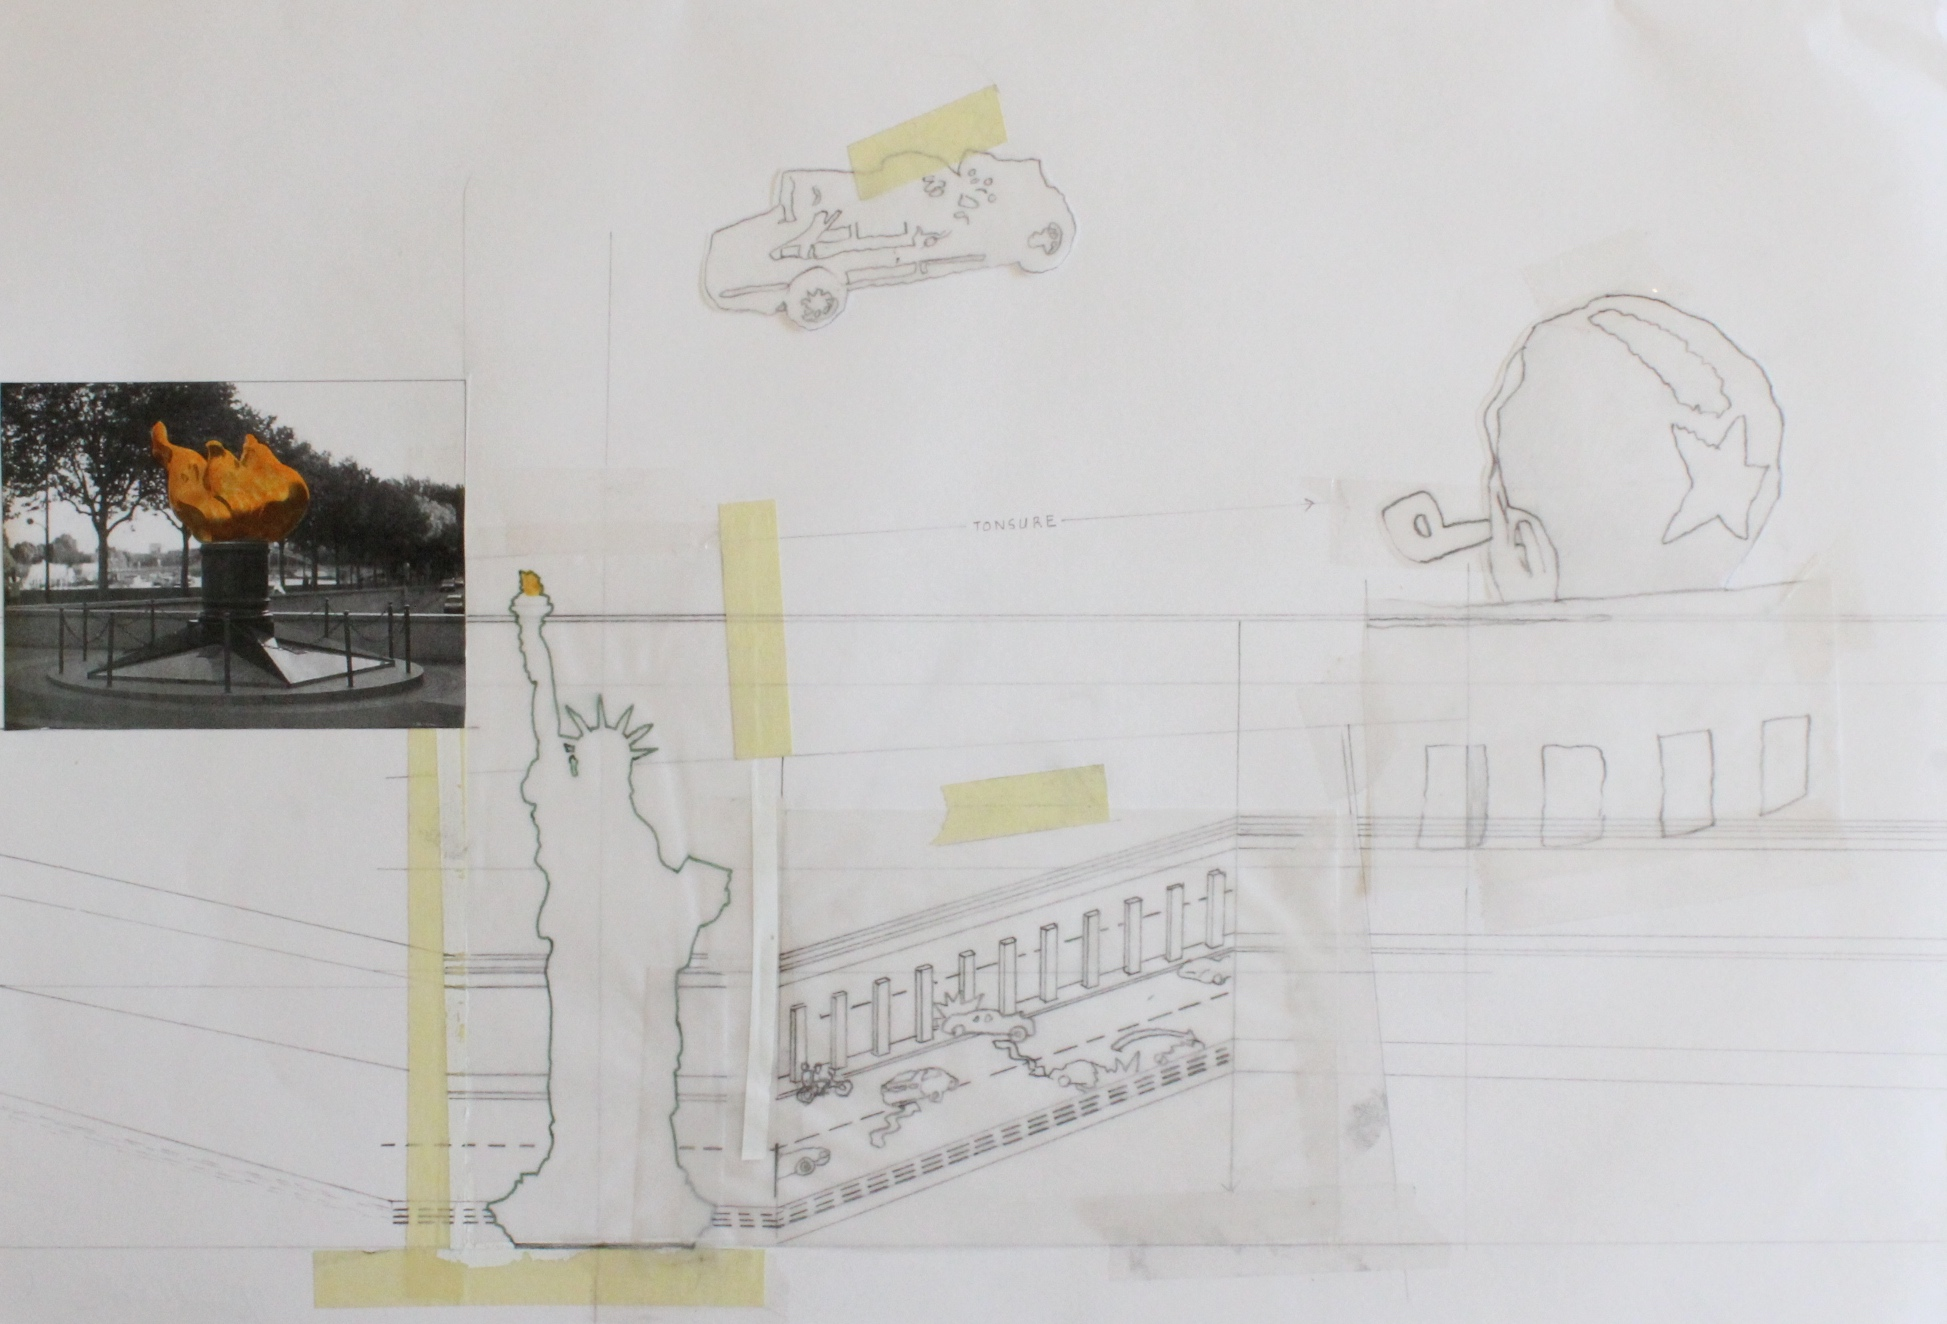 "'david clark - 11' - 11.5"" x 16.5"" - collage - $275"